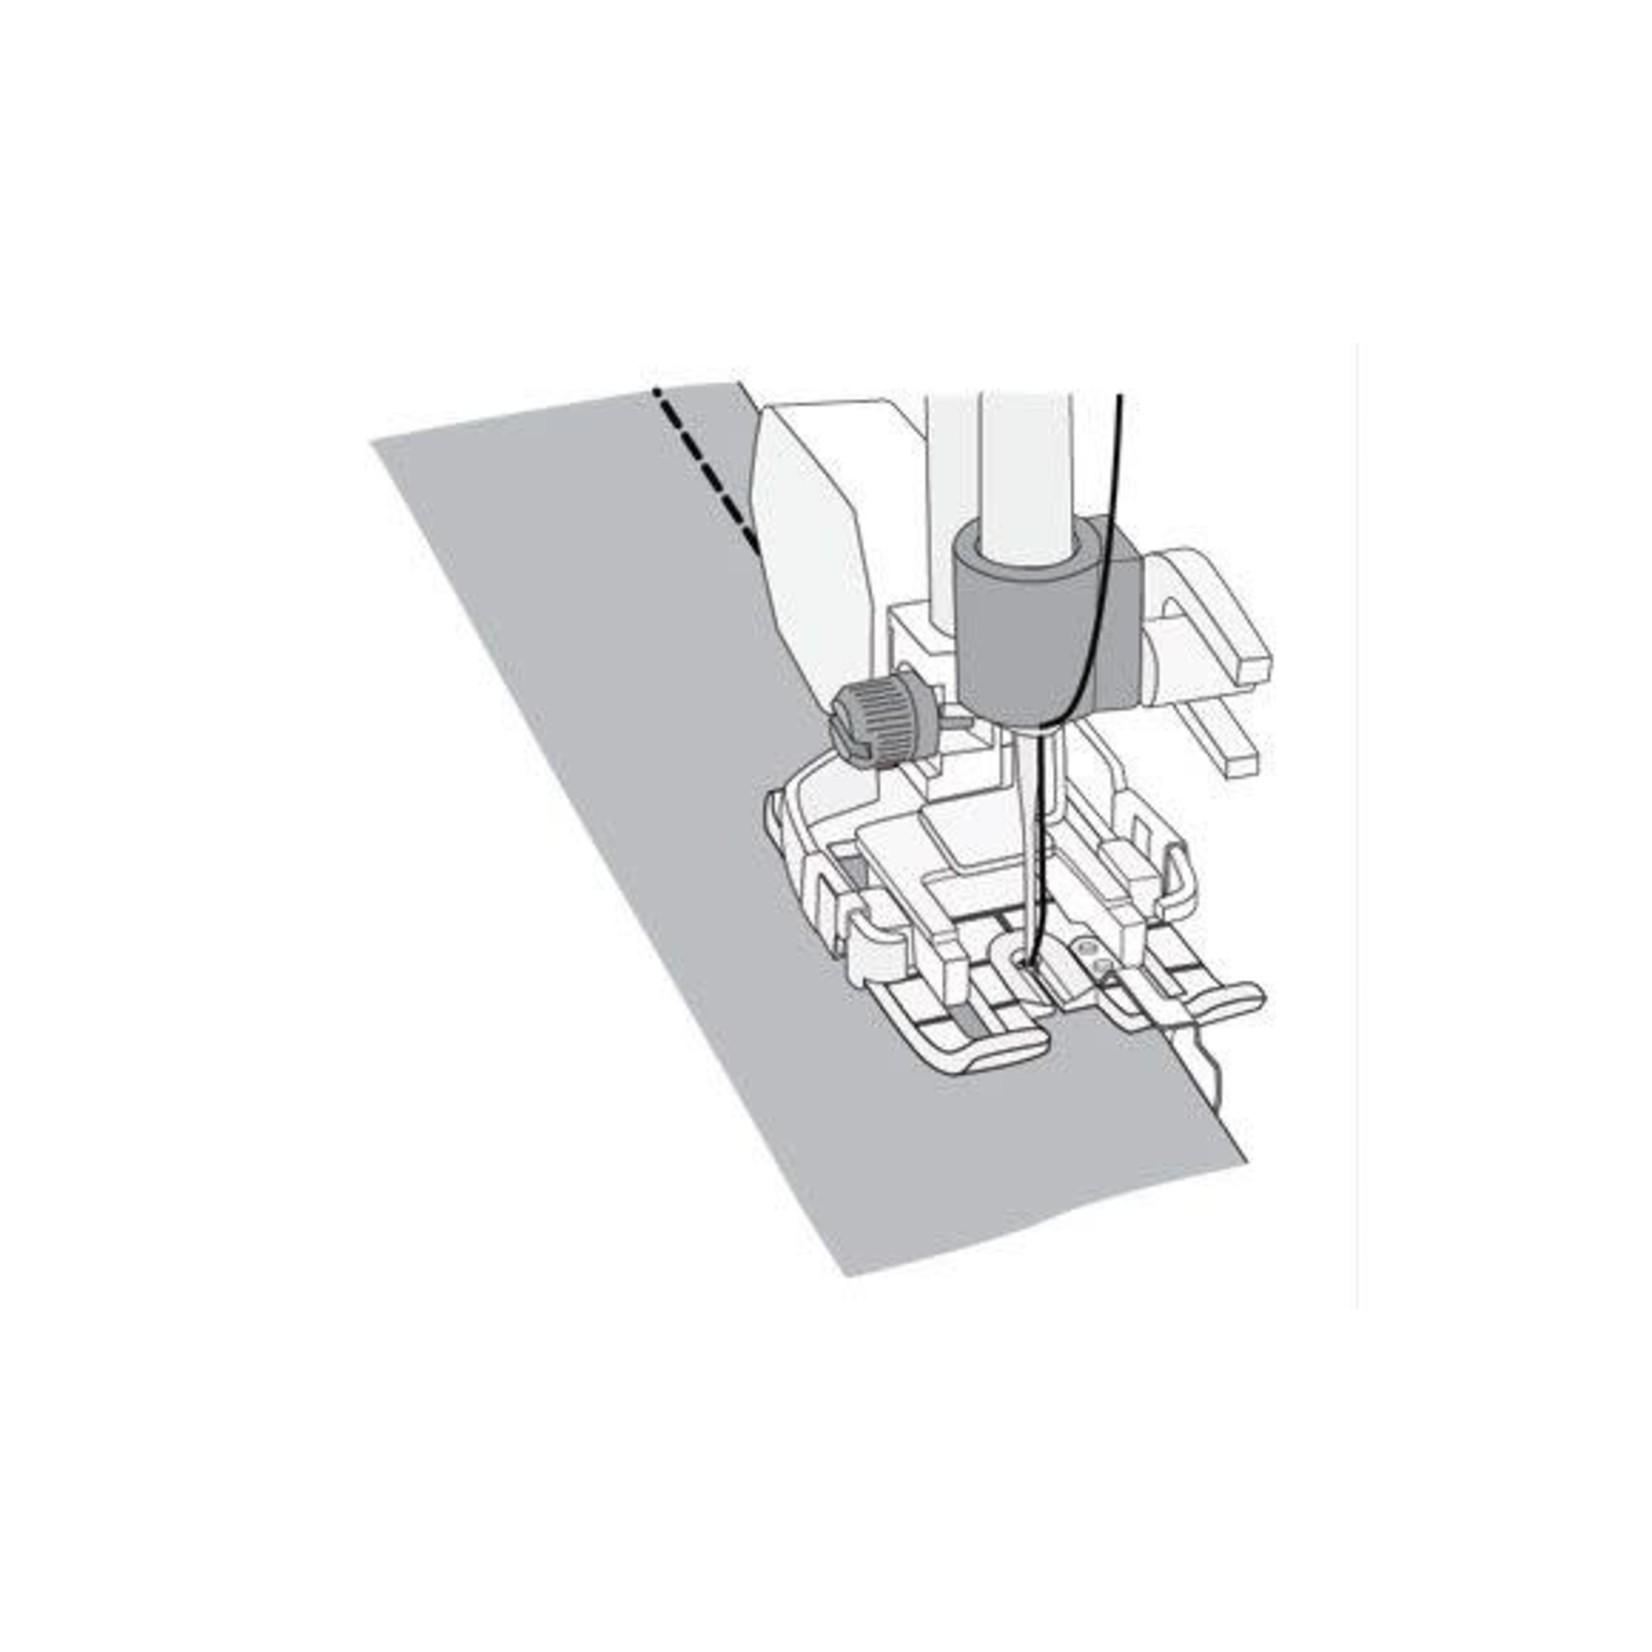 "Husqvarna Viking CHANGEABLE 1/4"" DECO GUIDE FOOT (steel)  TW"